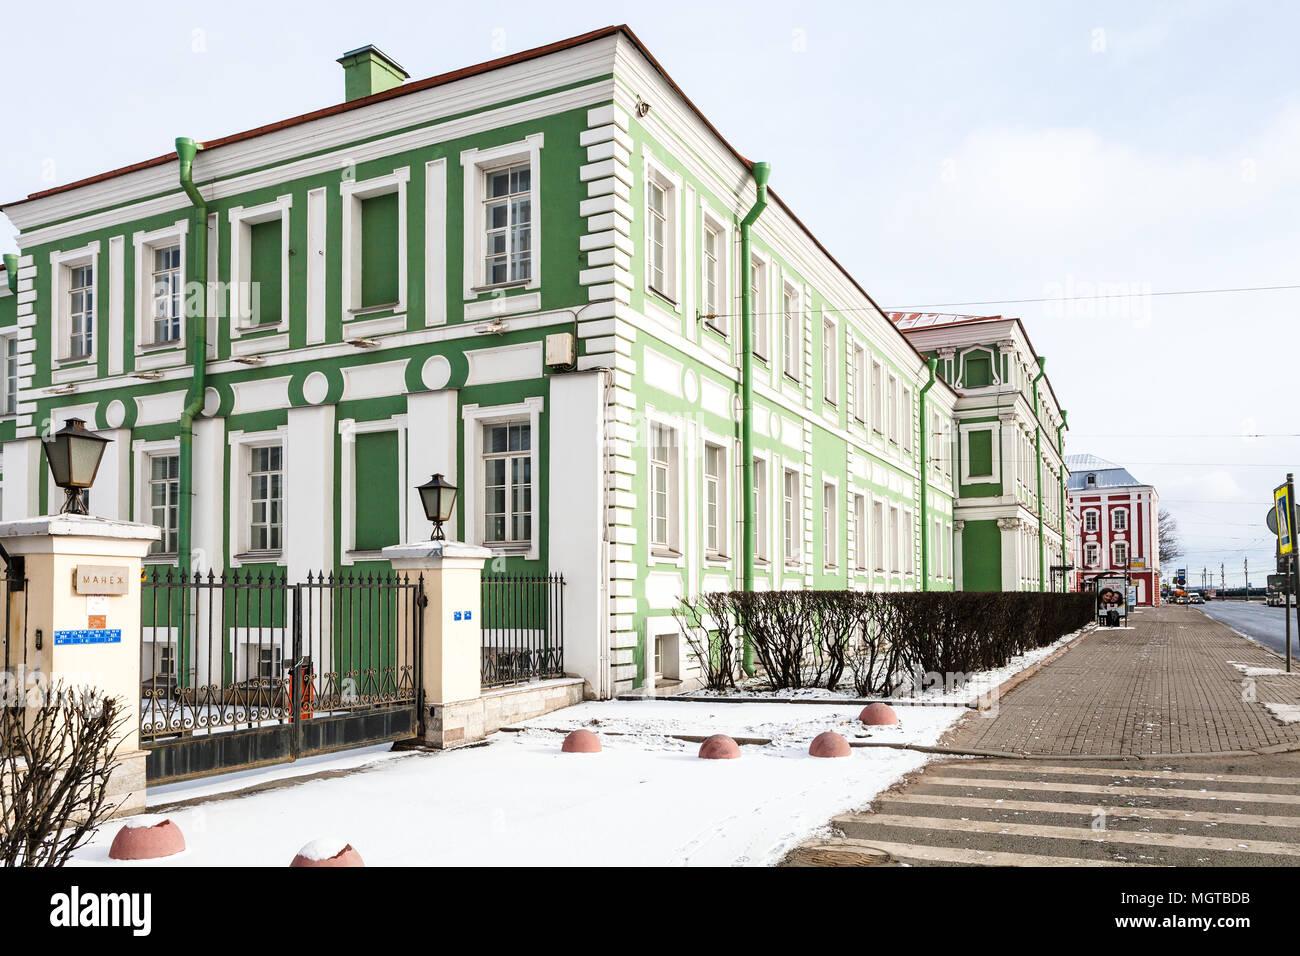 SAINT PETERSBURG, RUSSIA - MARCH 18, 2018: building of Saint Petersburg State University on Universitetskaya Embankment of Vasilievsky Island in St Pe Stock Photo